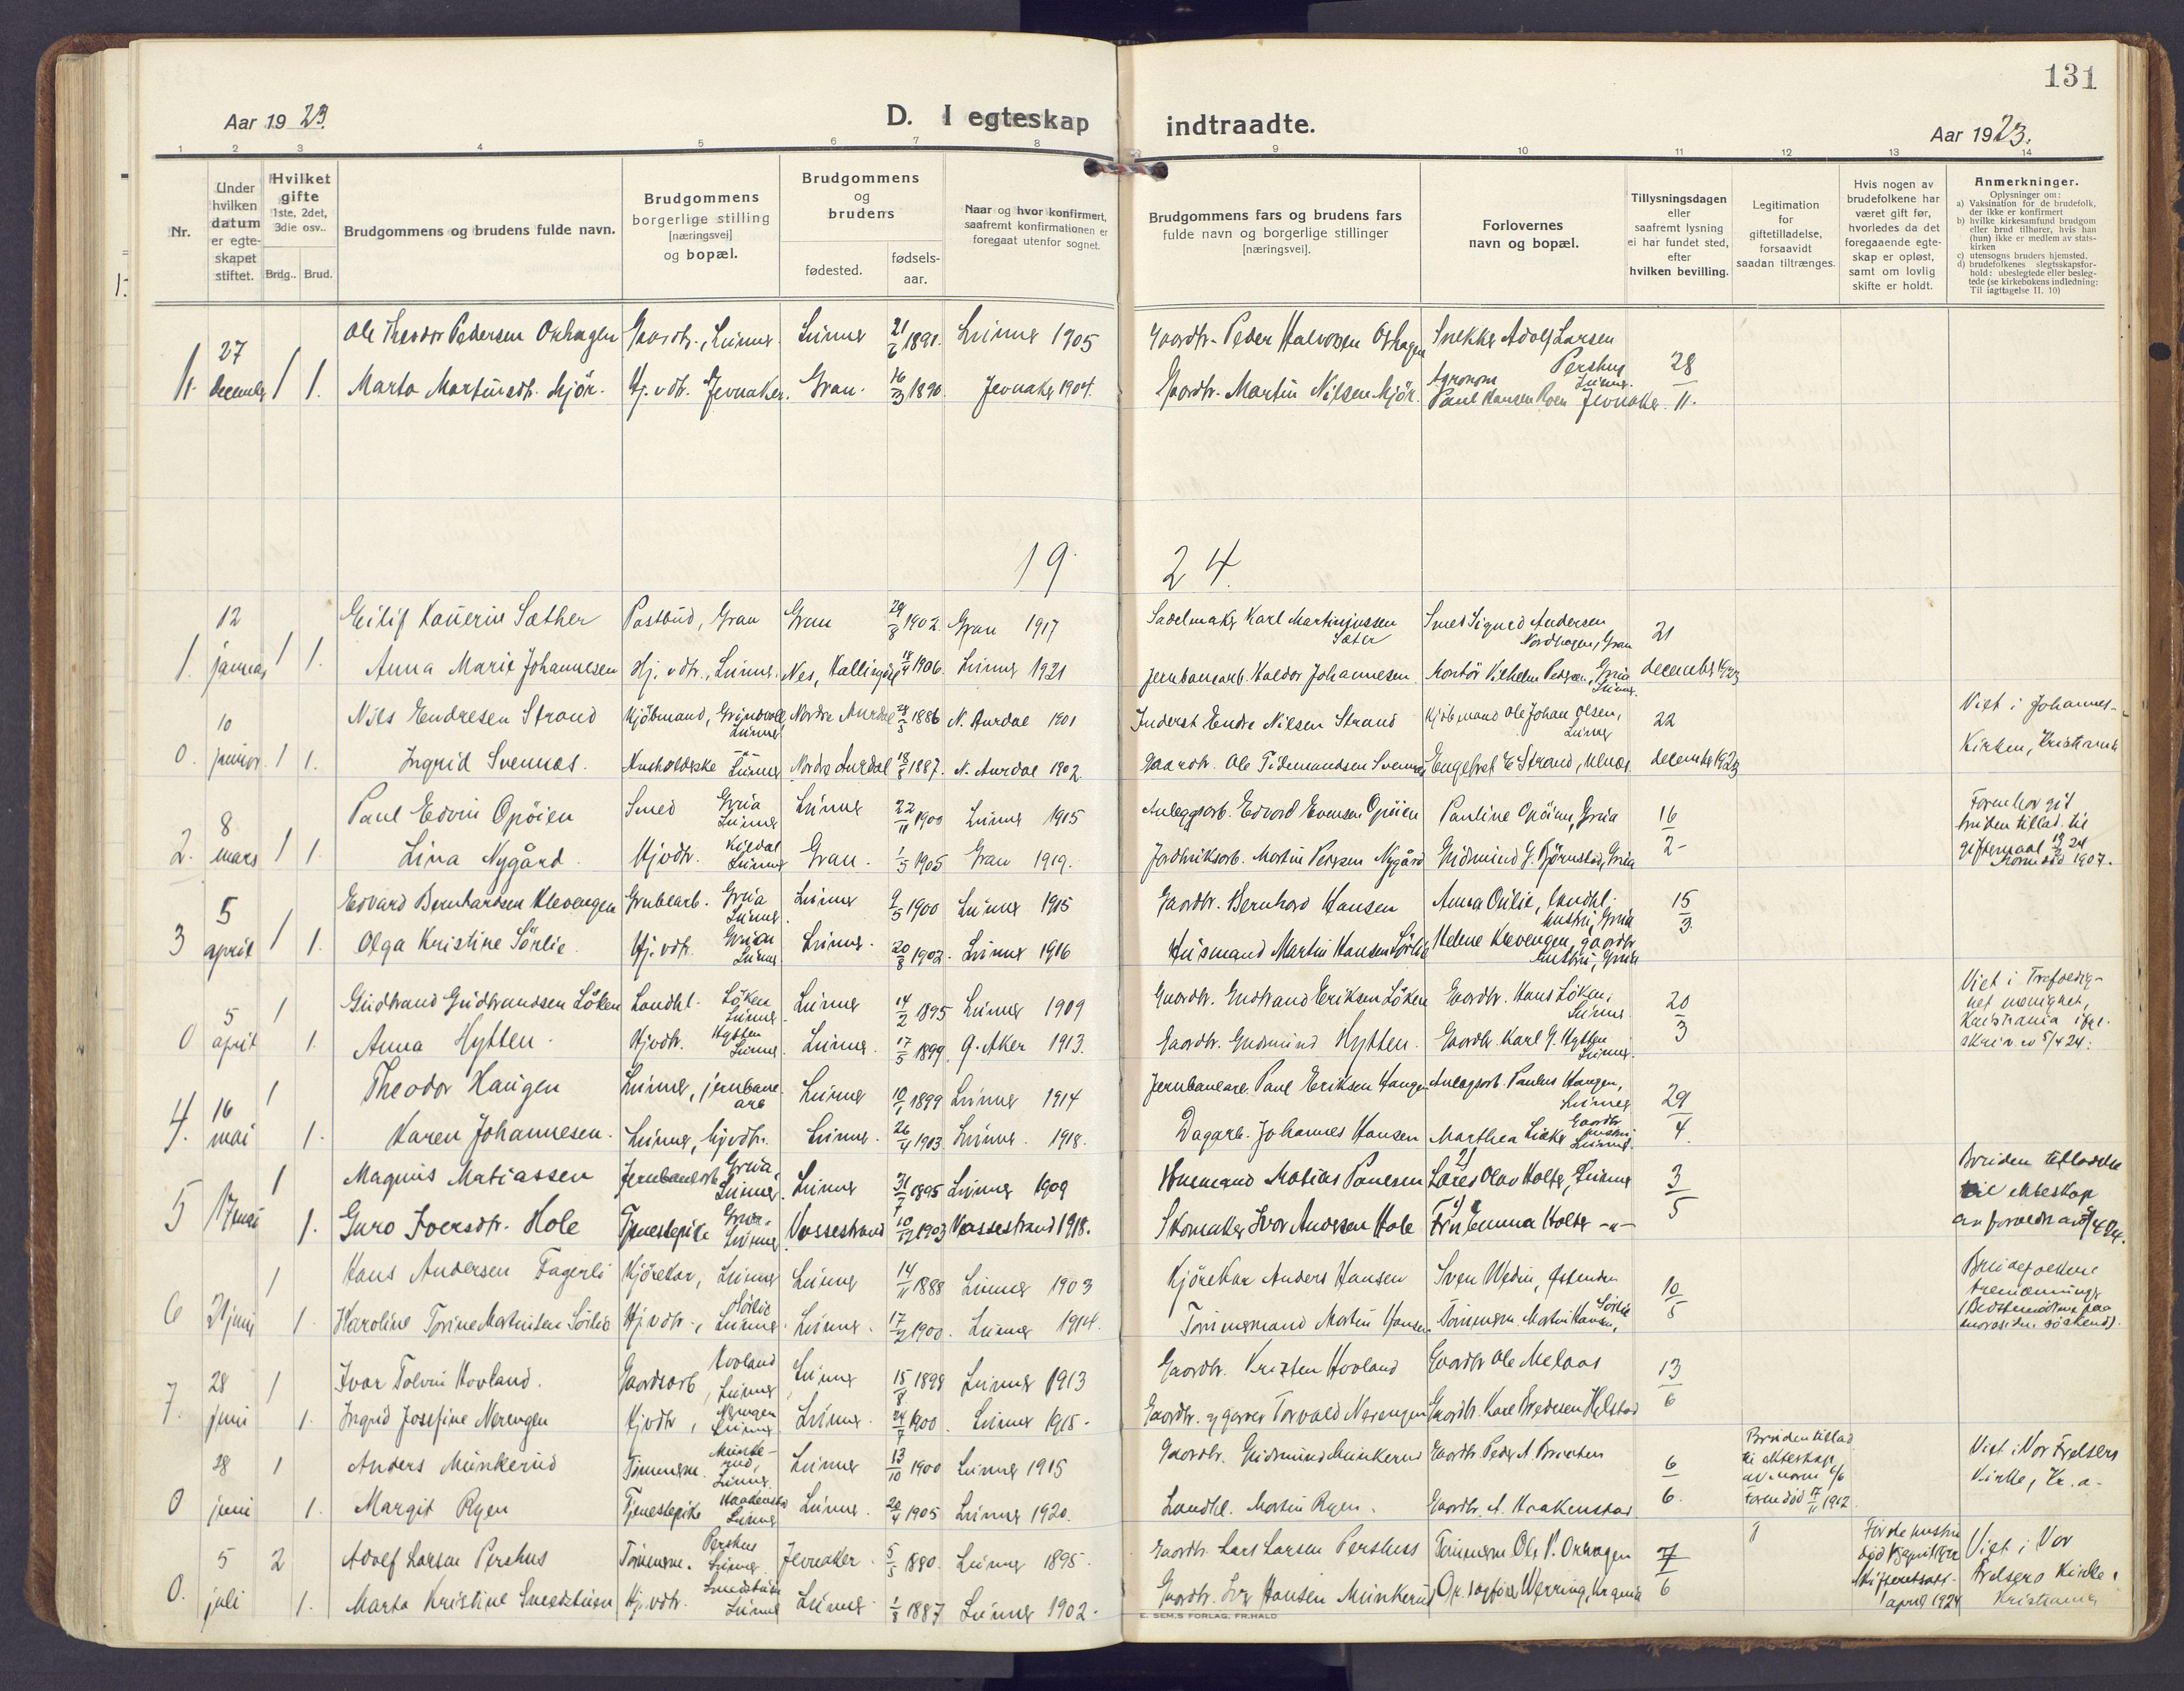 SAH, Lunner prestekontor, H/Ha/Haa/L0002: Ministerialbok nr. 2, 1922-1931, s. 131